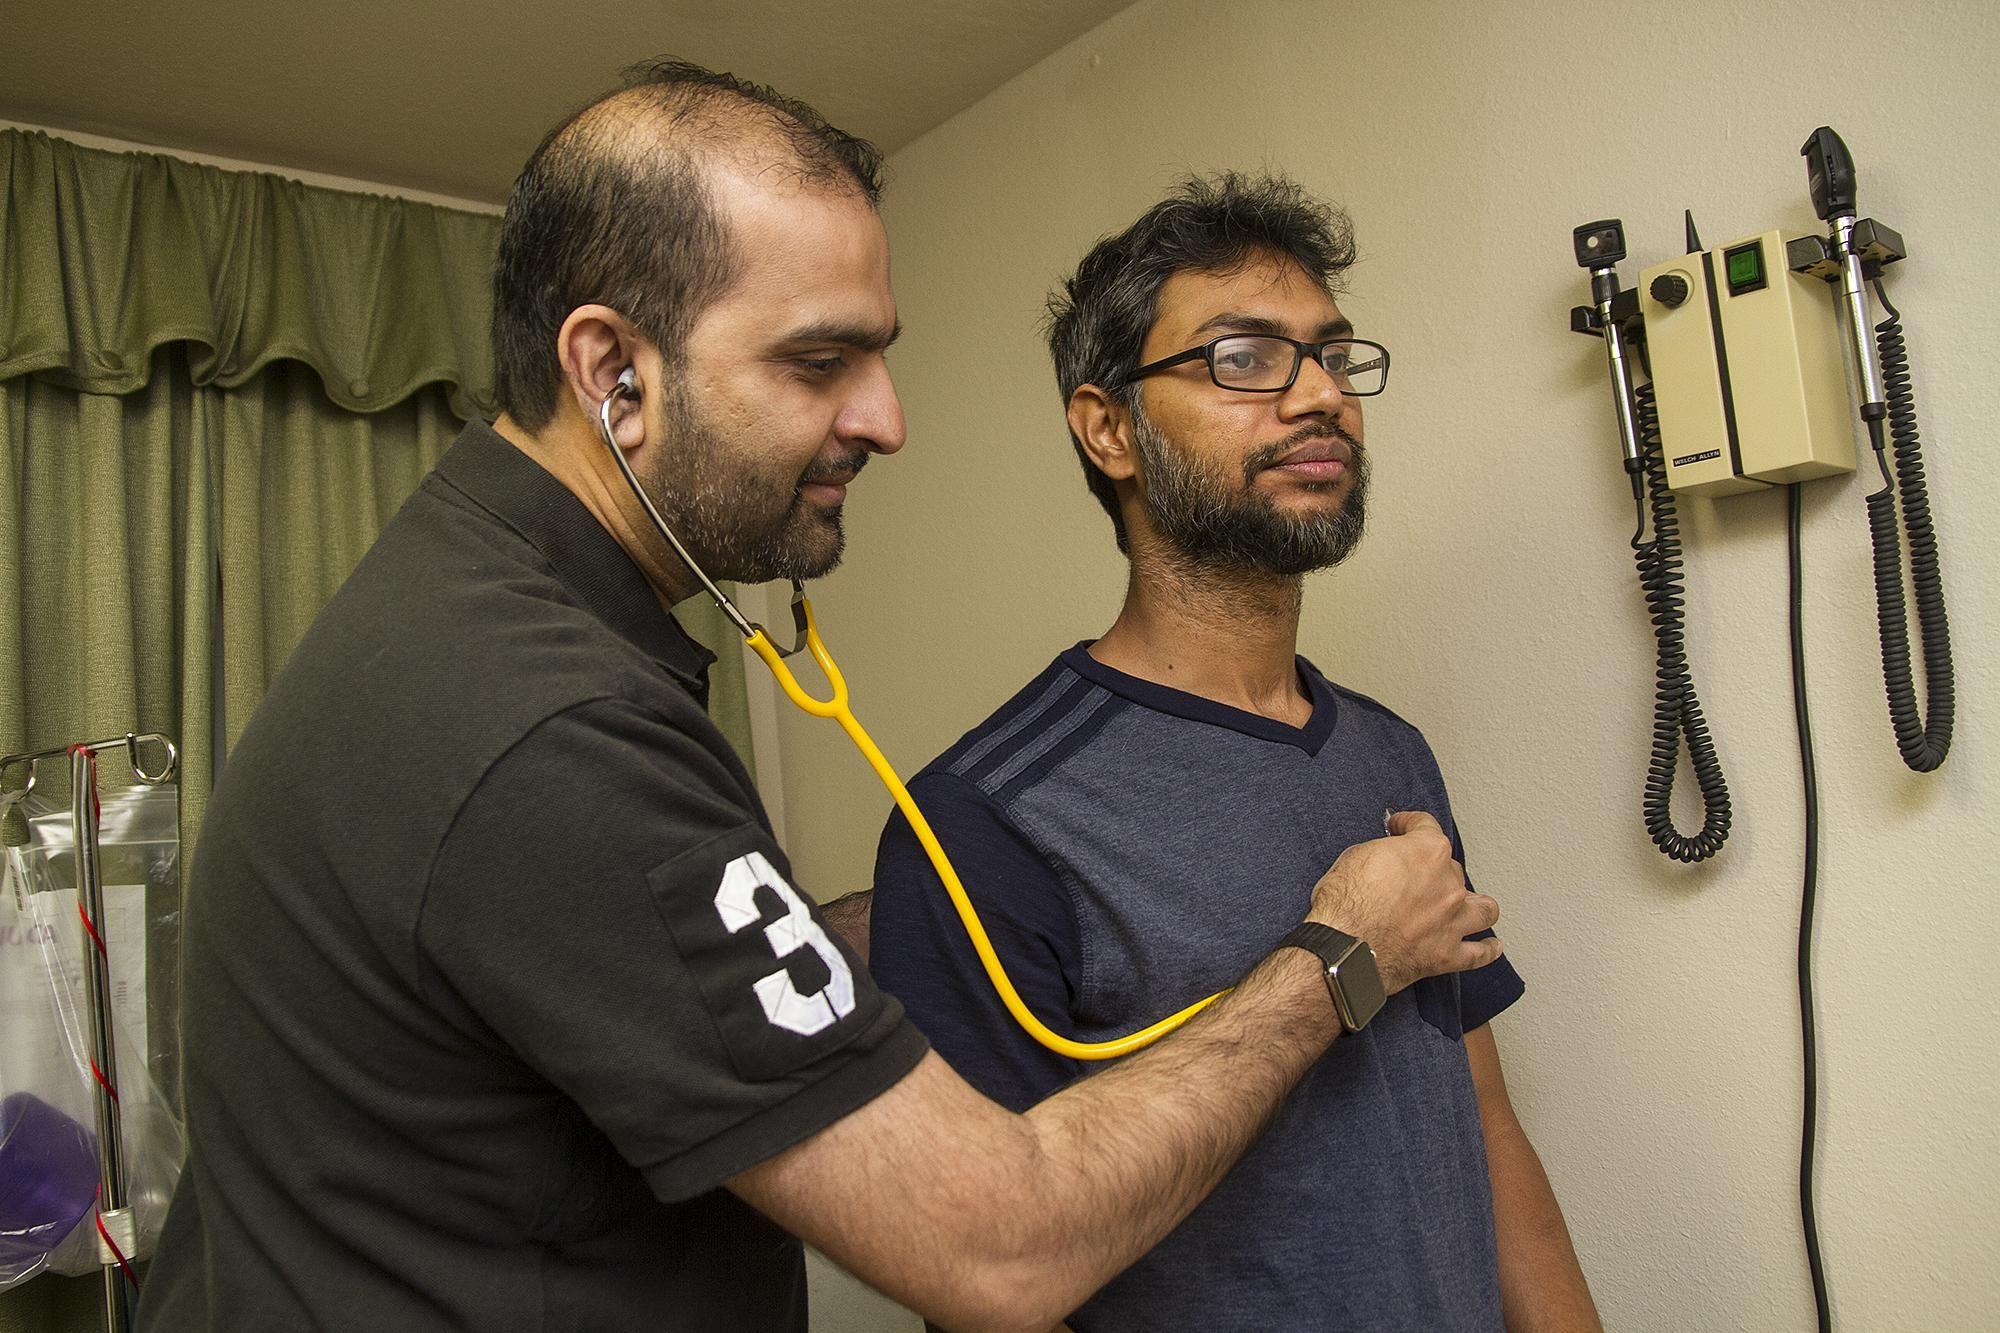 Free san antonio muslim clinic treats the uninsured to